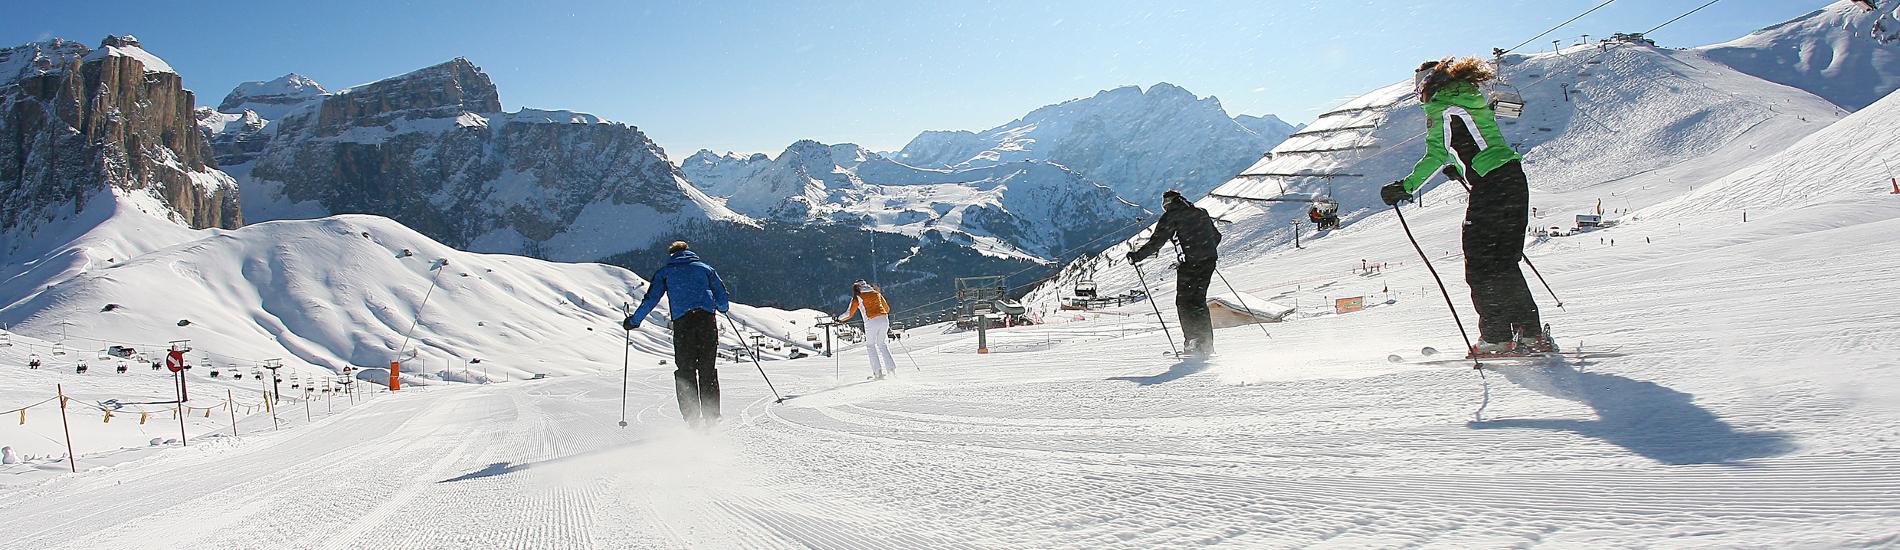 Sciate in Pista sulle Dolomiti Trentine